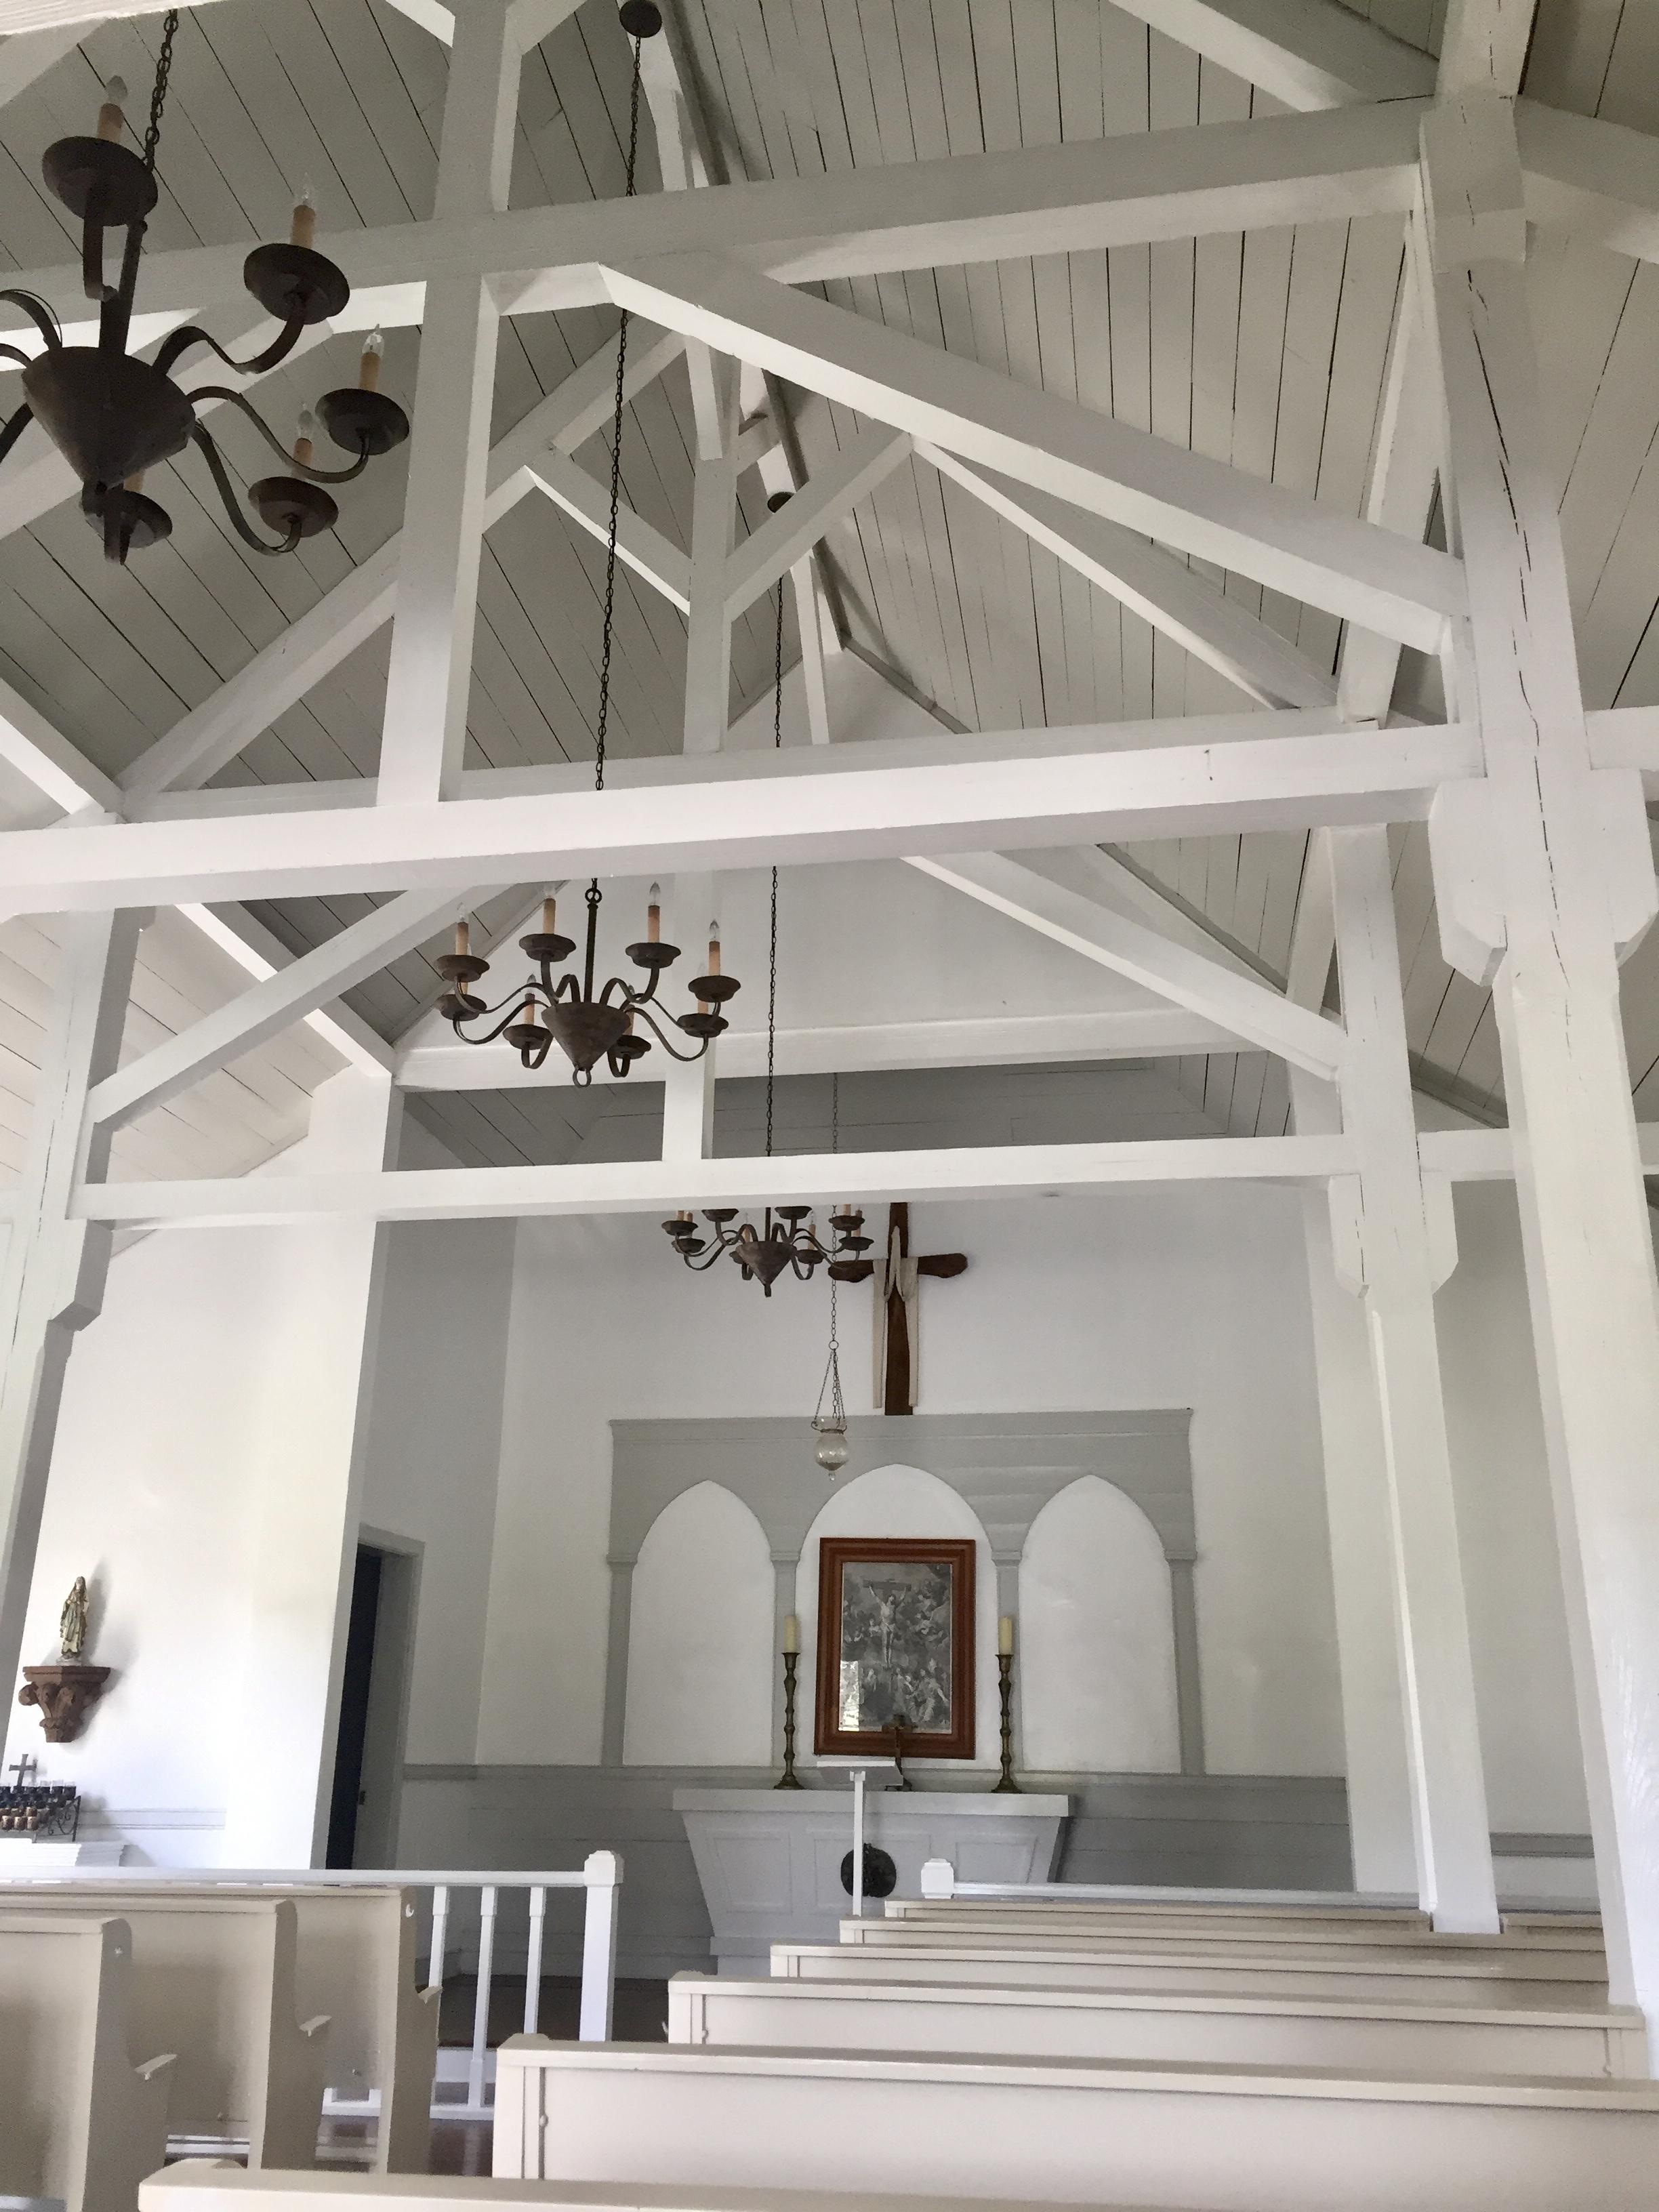 Historic Louisiana Architecture